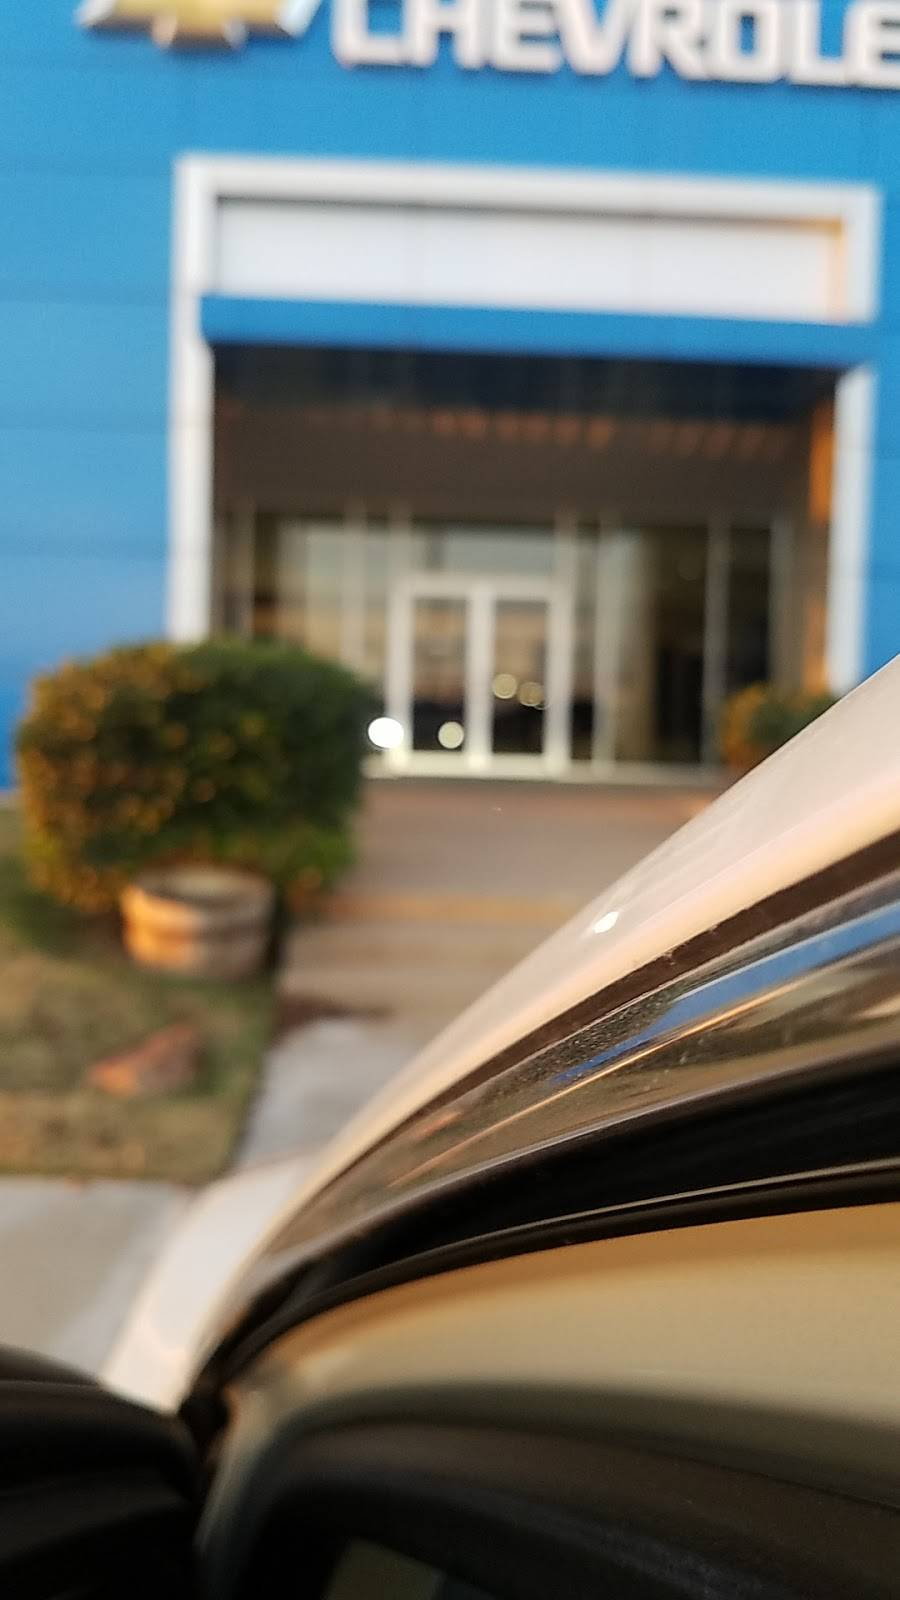 All American Chevrolet - car dealer  | Photo 6 of 7 | Address: 8802 US-84, Slaton, TX 79364, USA | Phone: (806) 828-6261